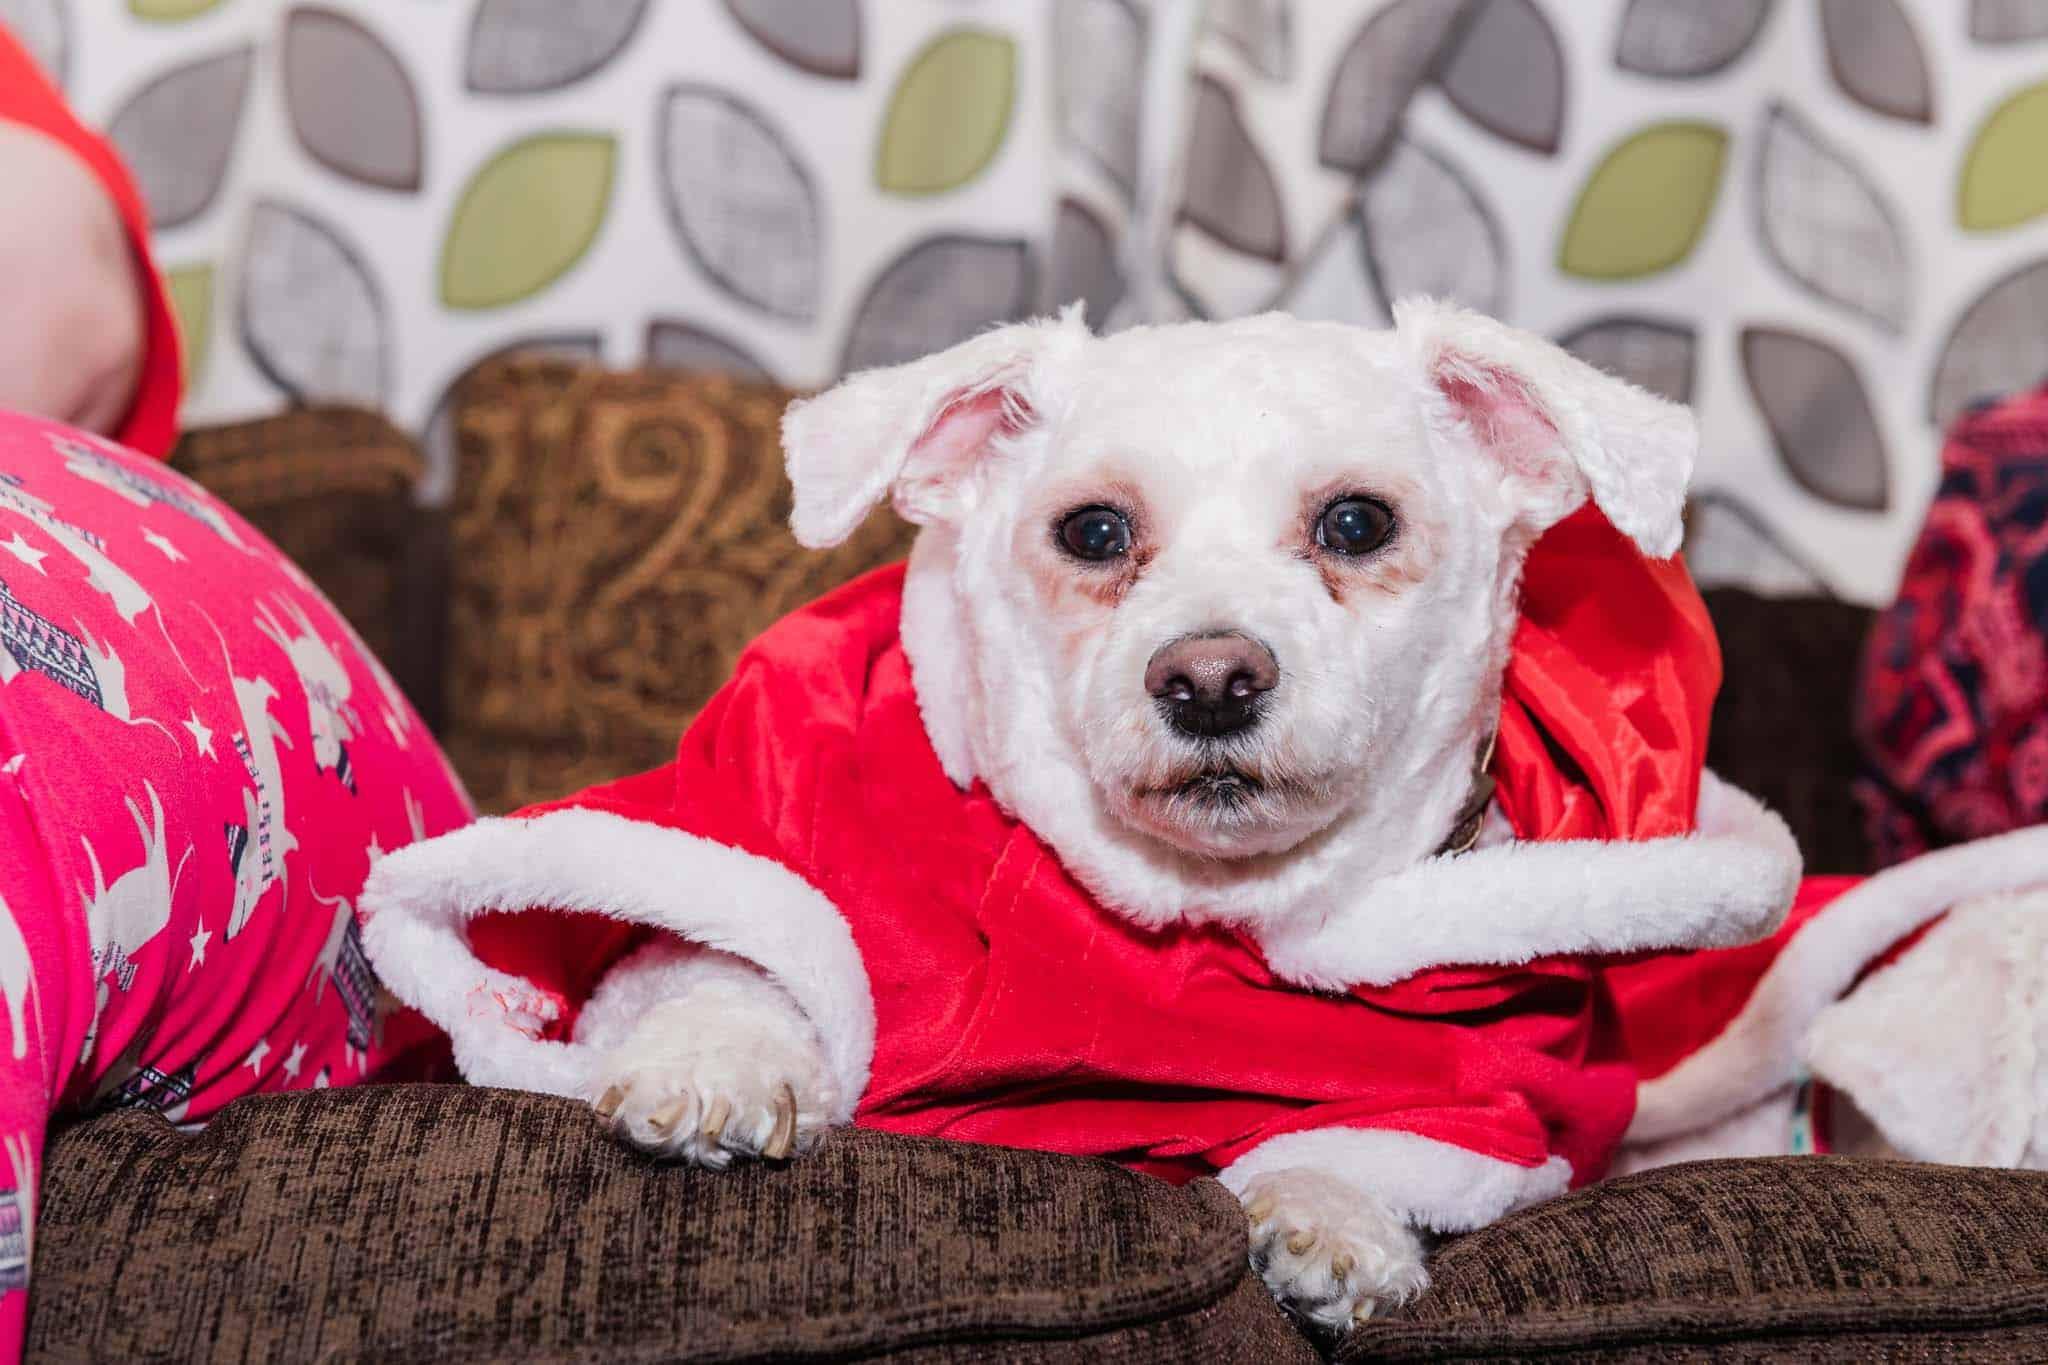 yoda's santa dog costume festive season